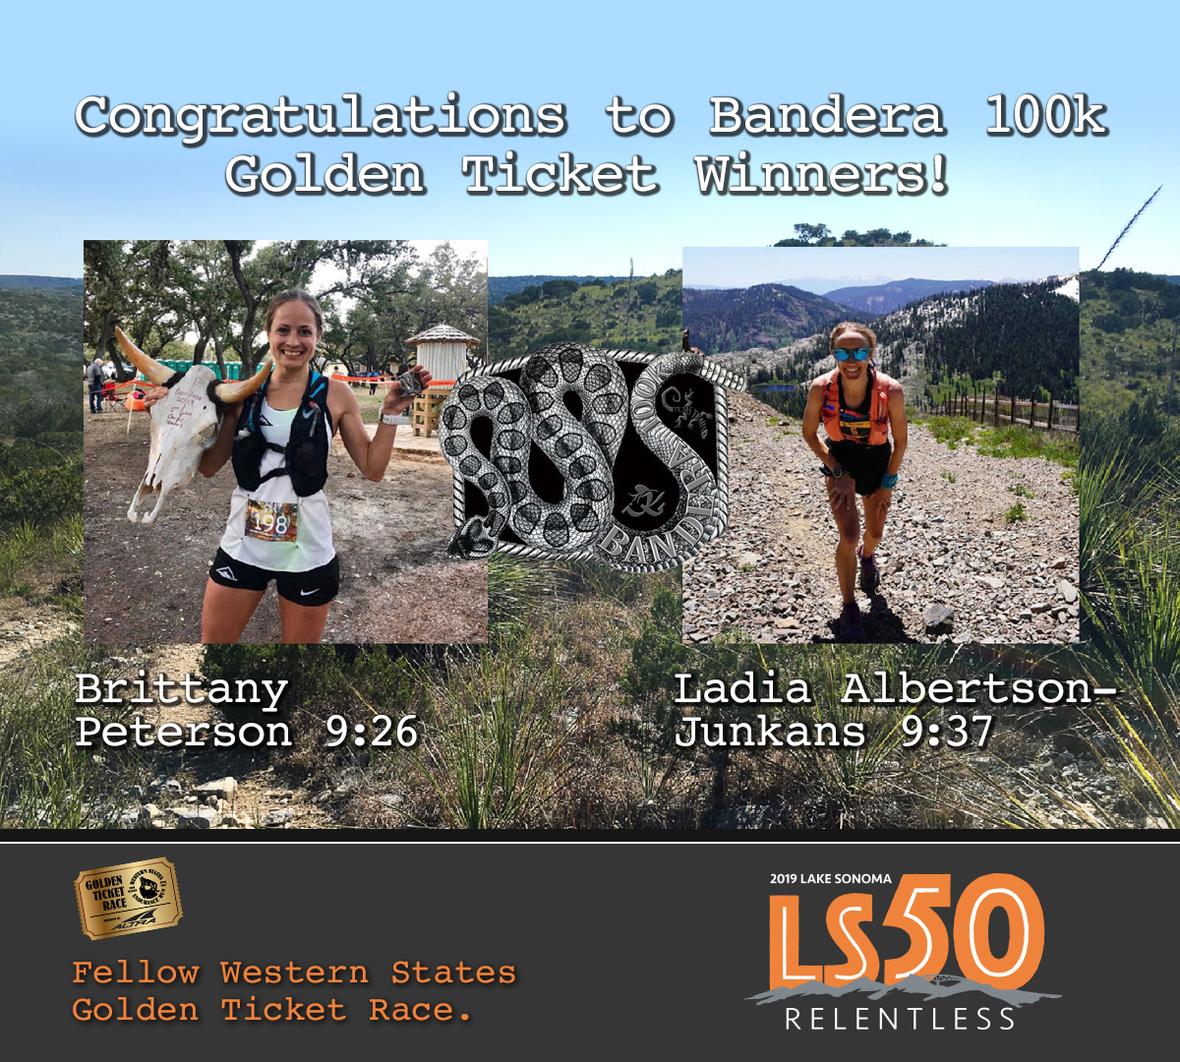 LS50 bandera winners woman